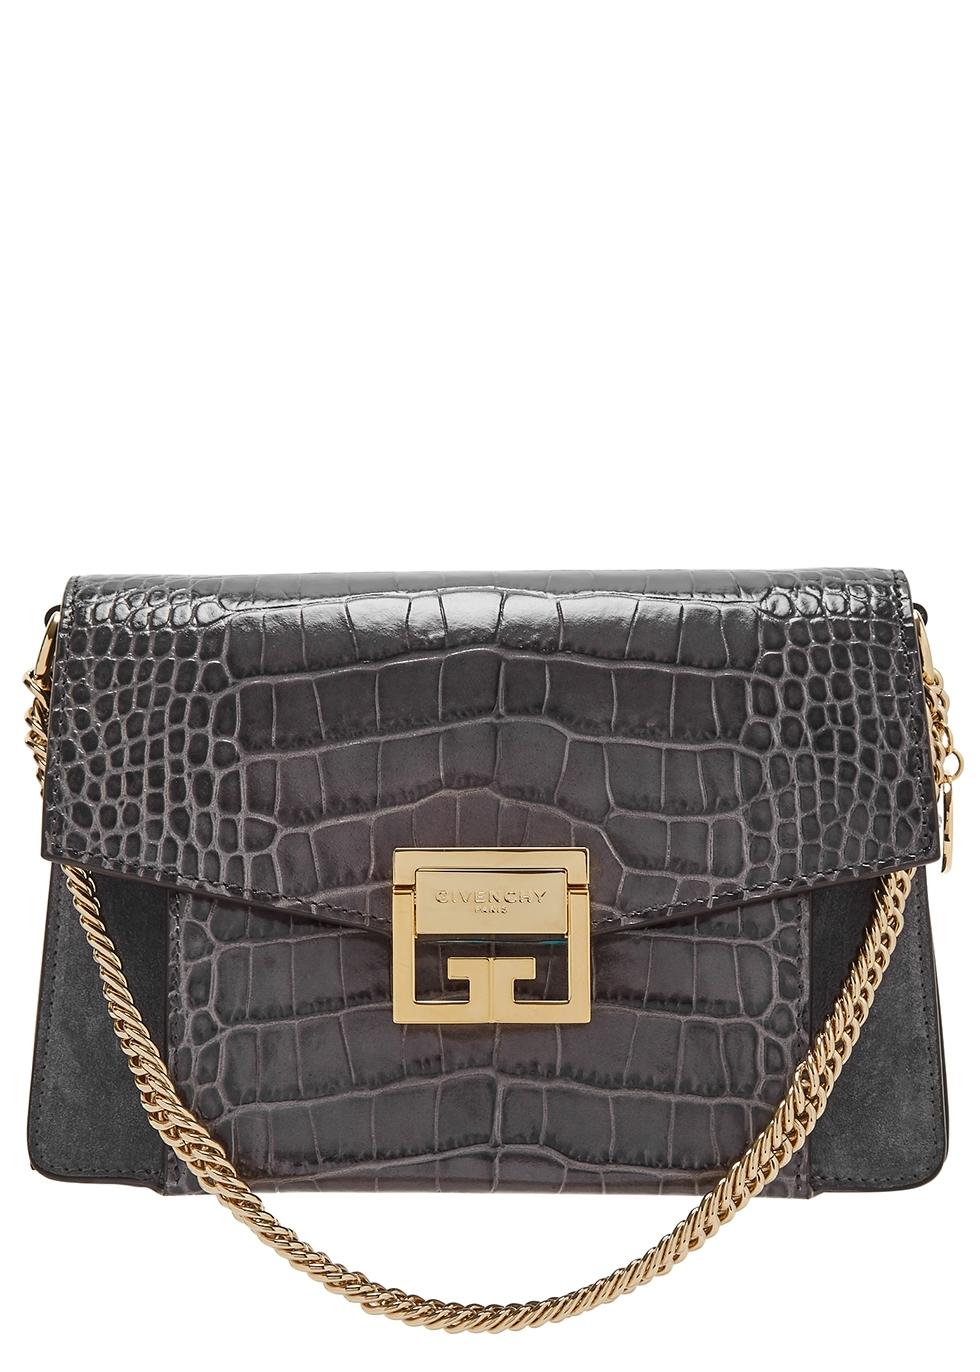 94056a829d Givenchy - Designer Clothing, Bags, Scarves - Harvey Nichols